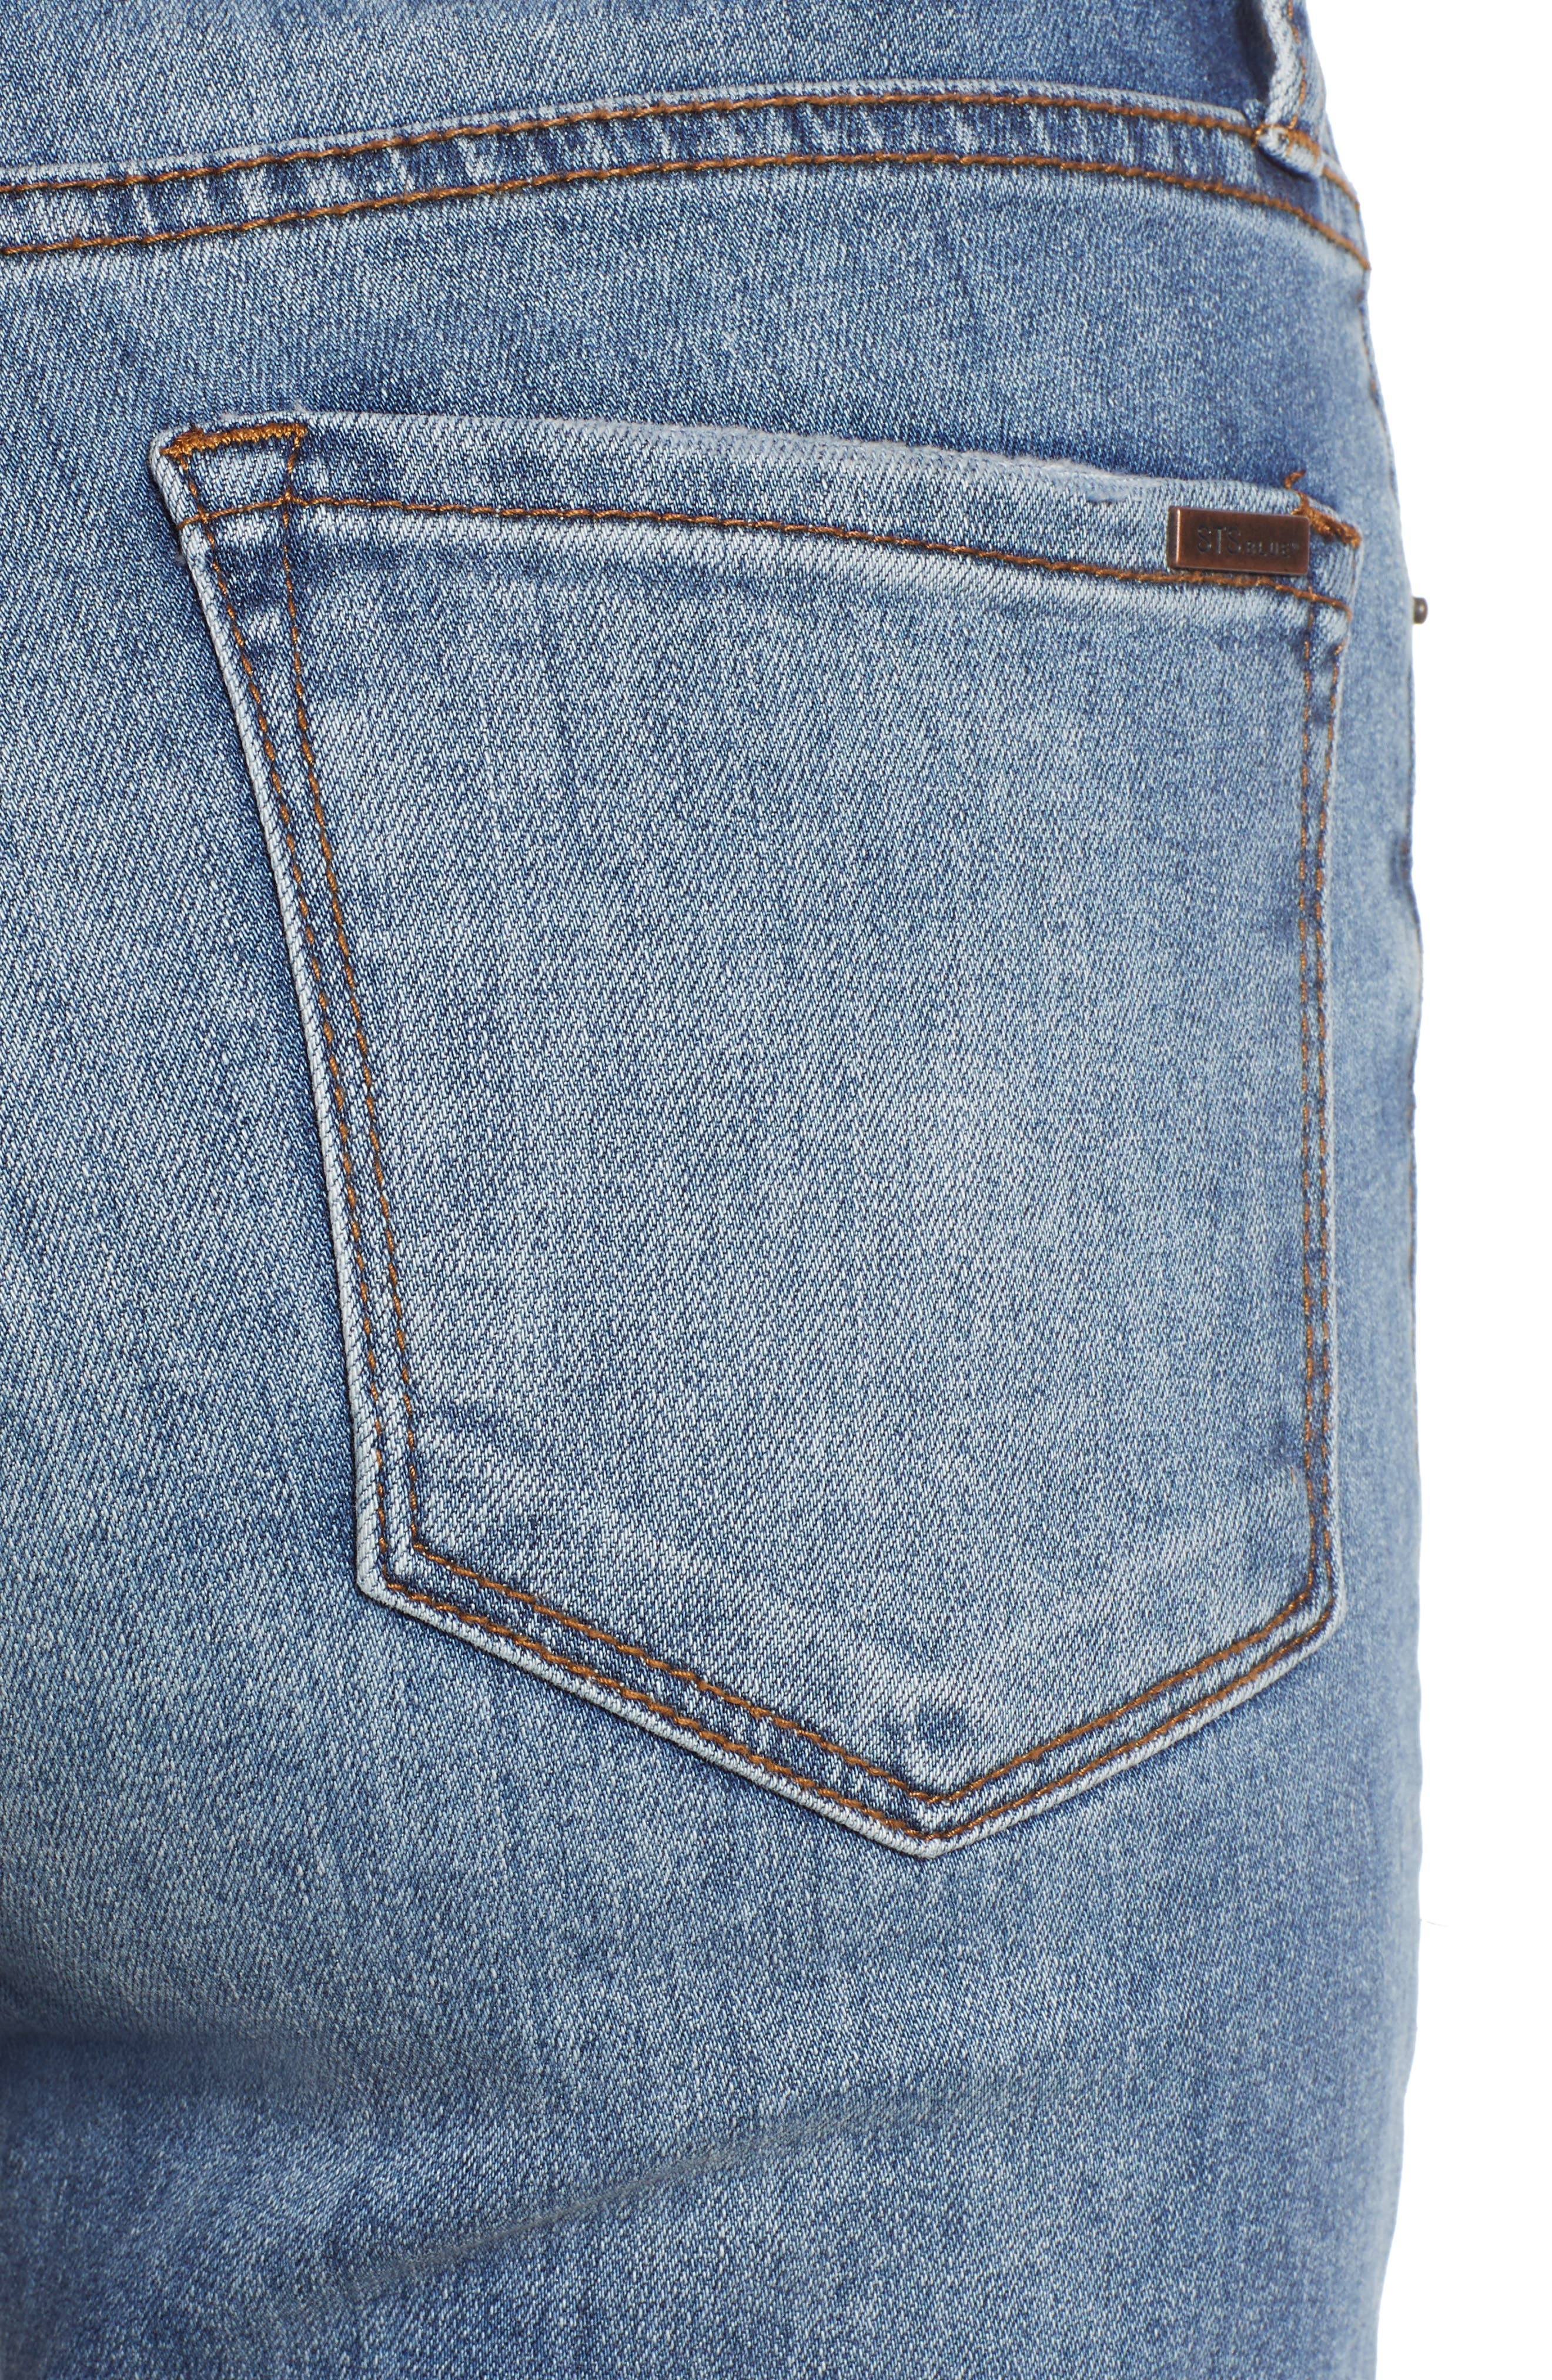 STS Blue Brooke Crop Flare Jeans,                             Alternate thumbnail 4, color,                             TOPAZ